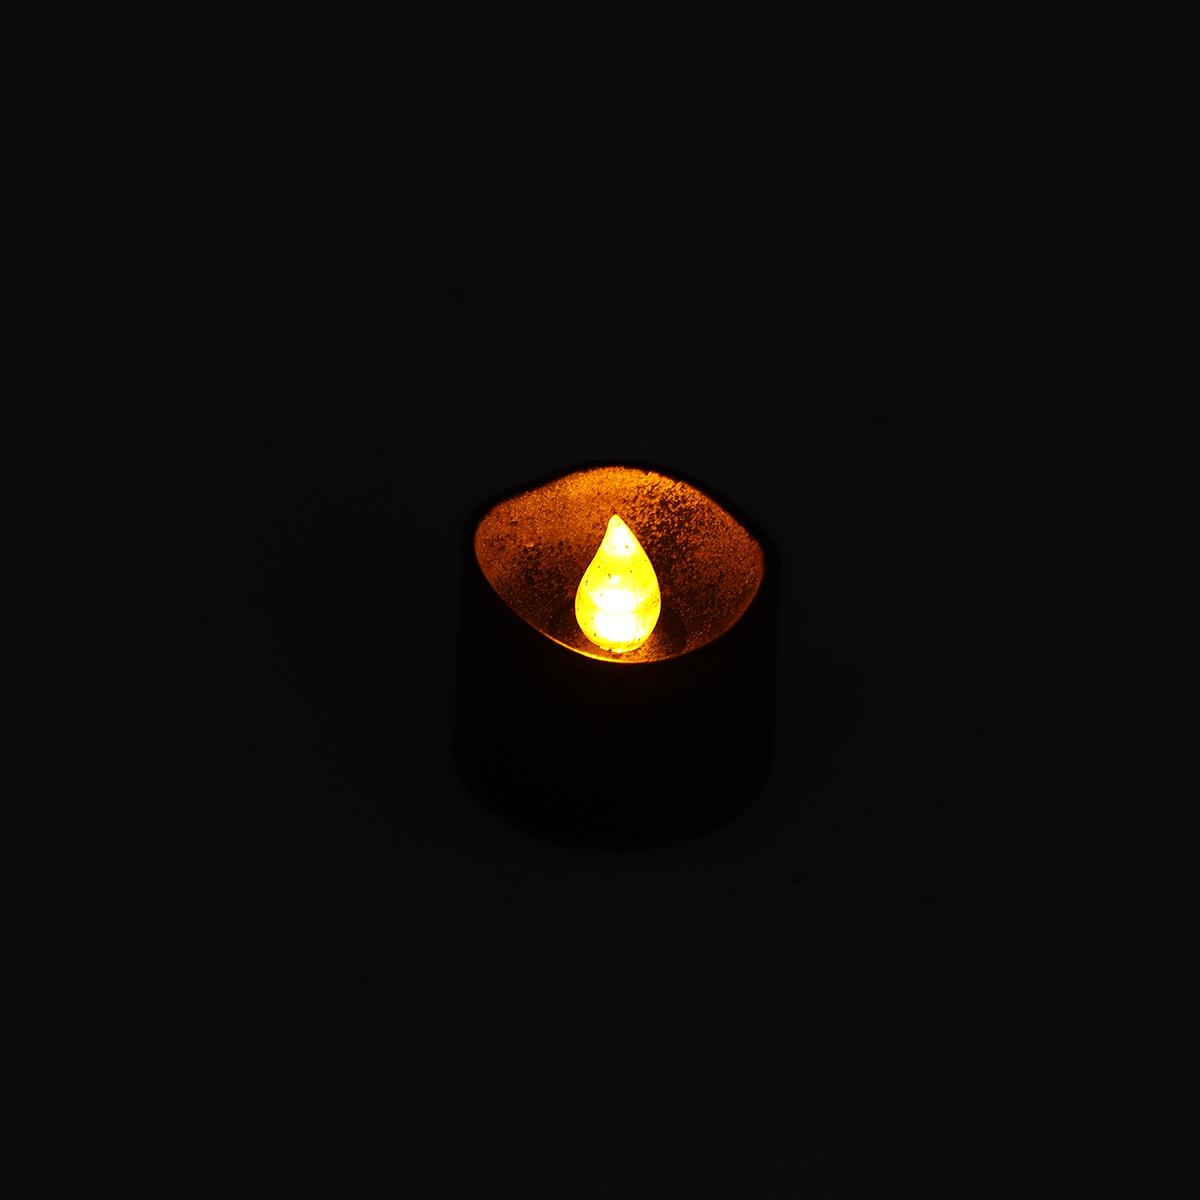 12PCS Christmas Halloween Flameless Candles LED Tea Lights Battery Operated Deco